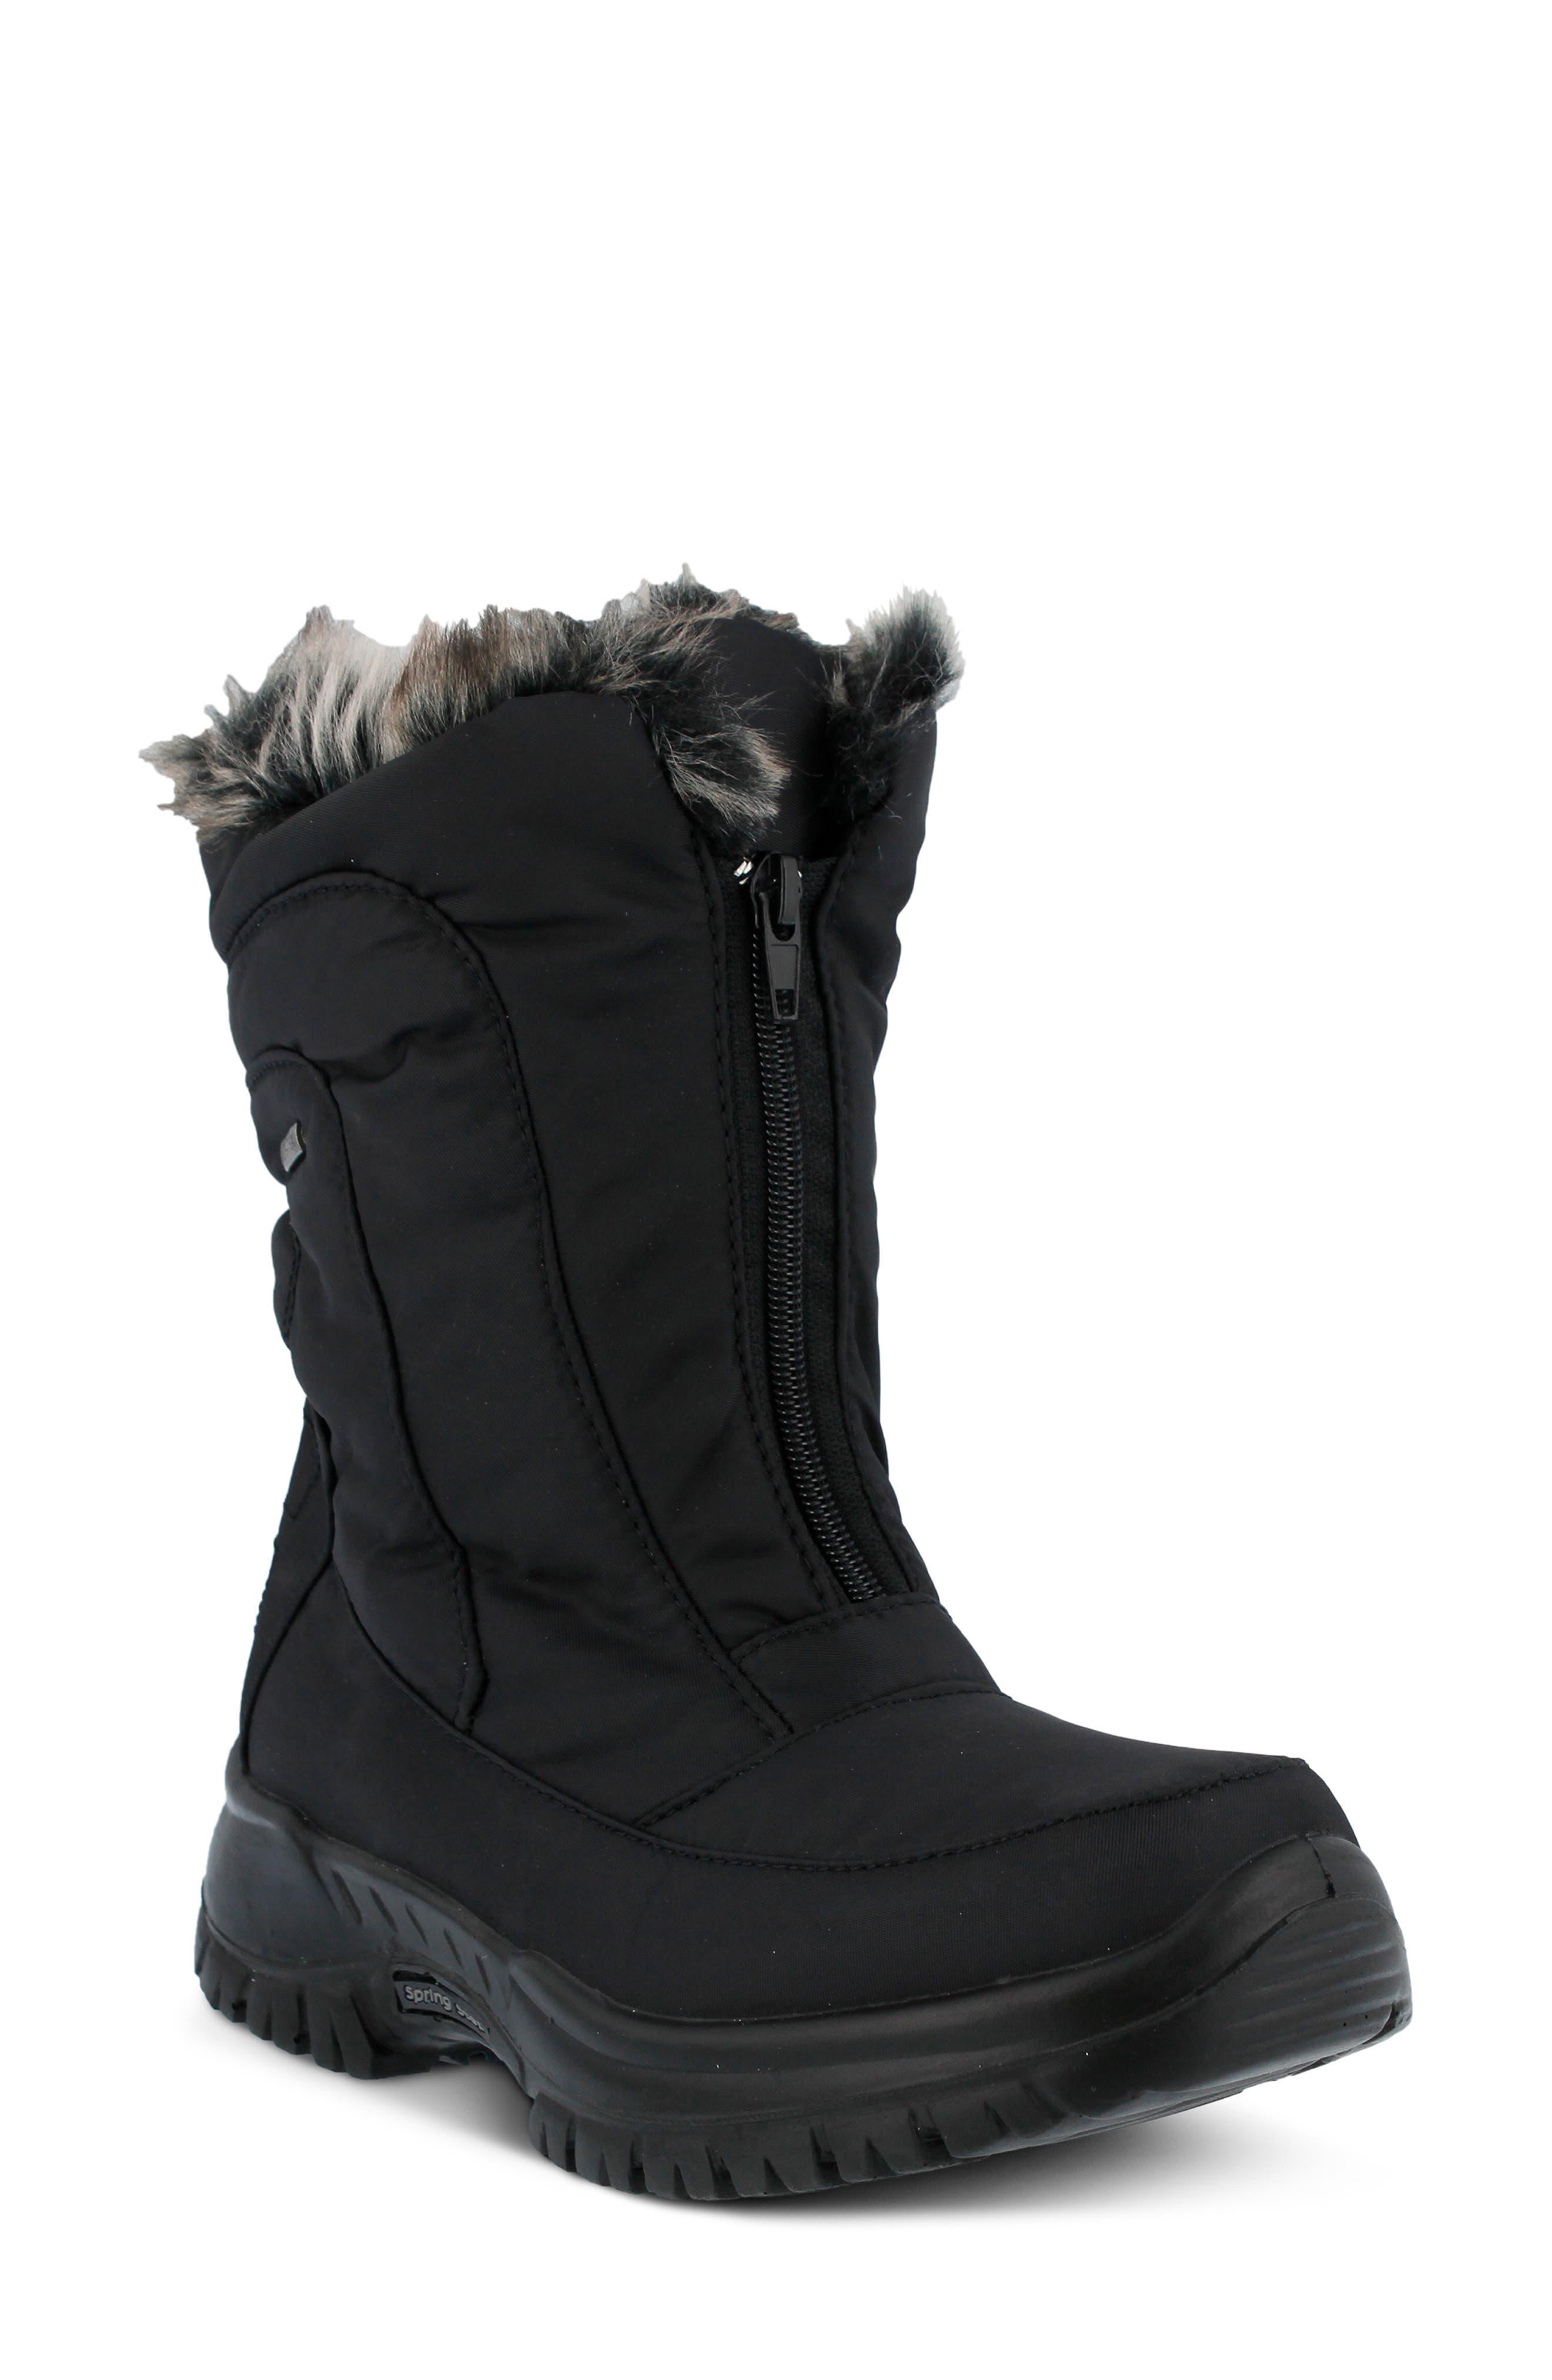 SPRING STEP Zigzag Waterproof Faux Fur Bootie, Main, color, BLACK FABRIC